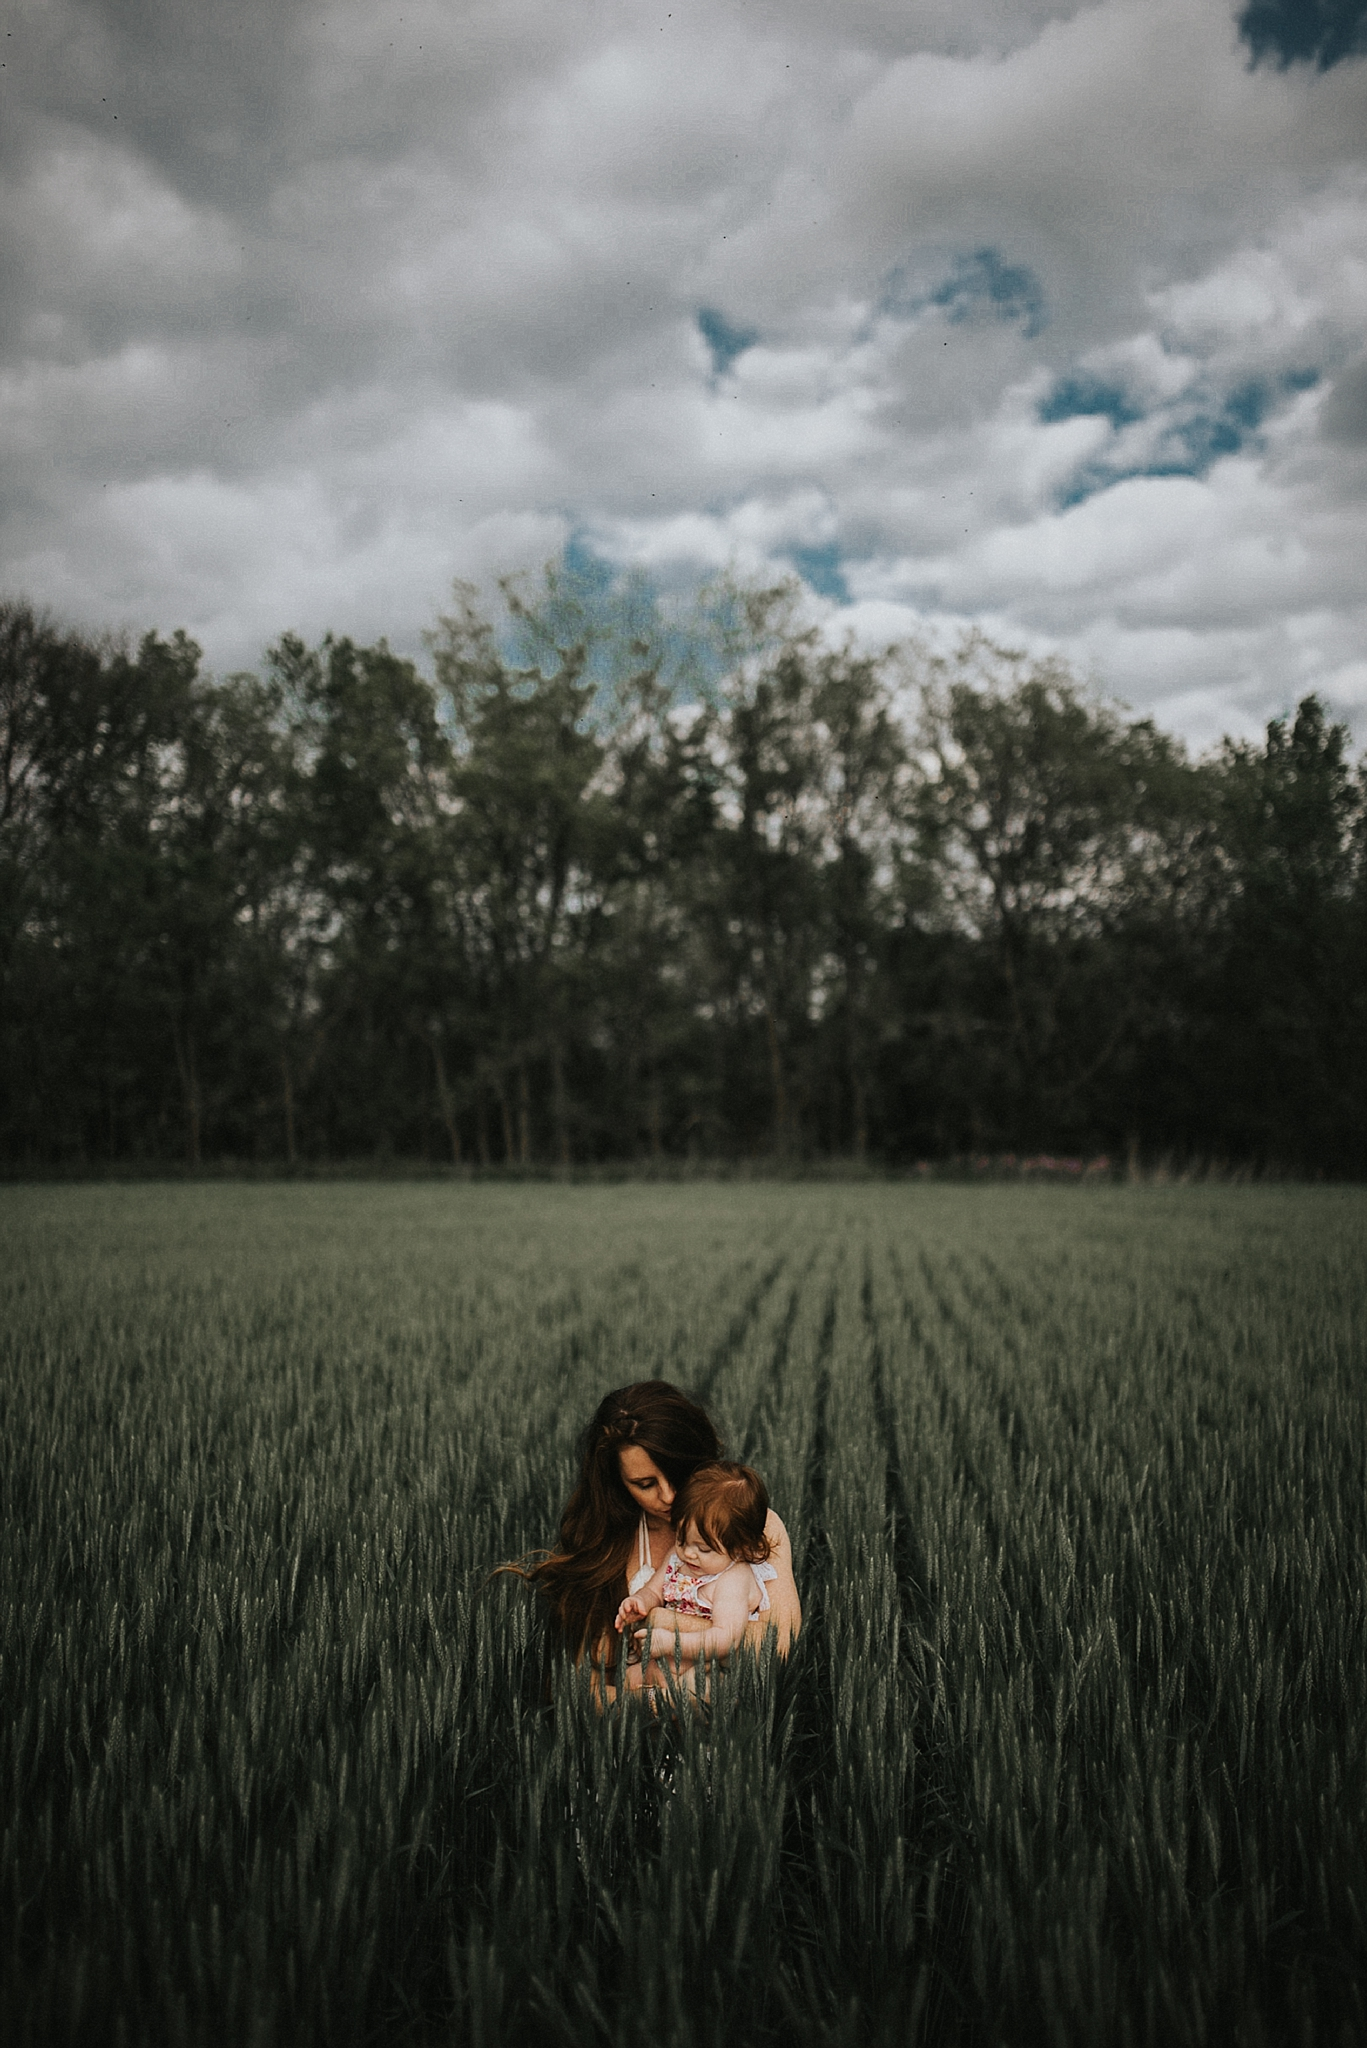 twyla jones photography - mother daughter - field and forest-4430_treasure coast florida.jpg